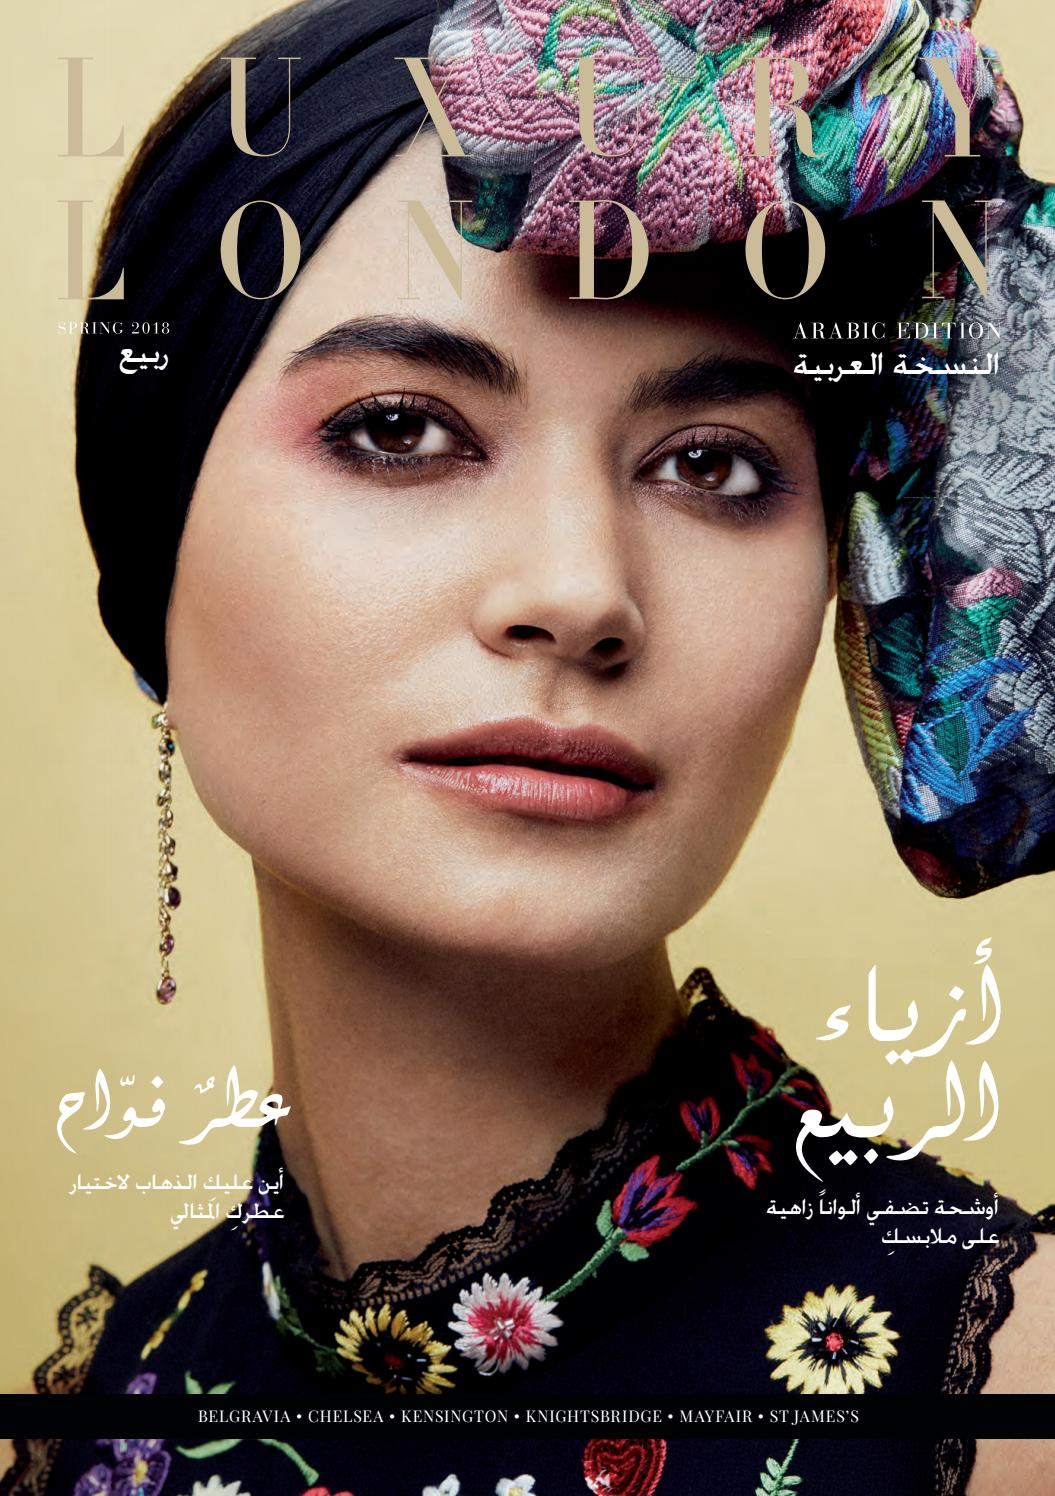 36d511135 Luxury London Arabic Spring 2018 by Luxury London Media - issuu